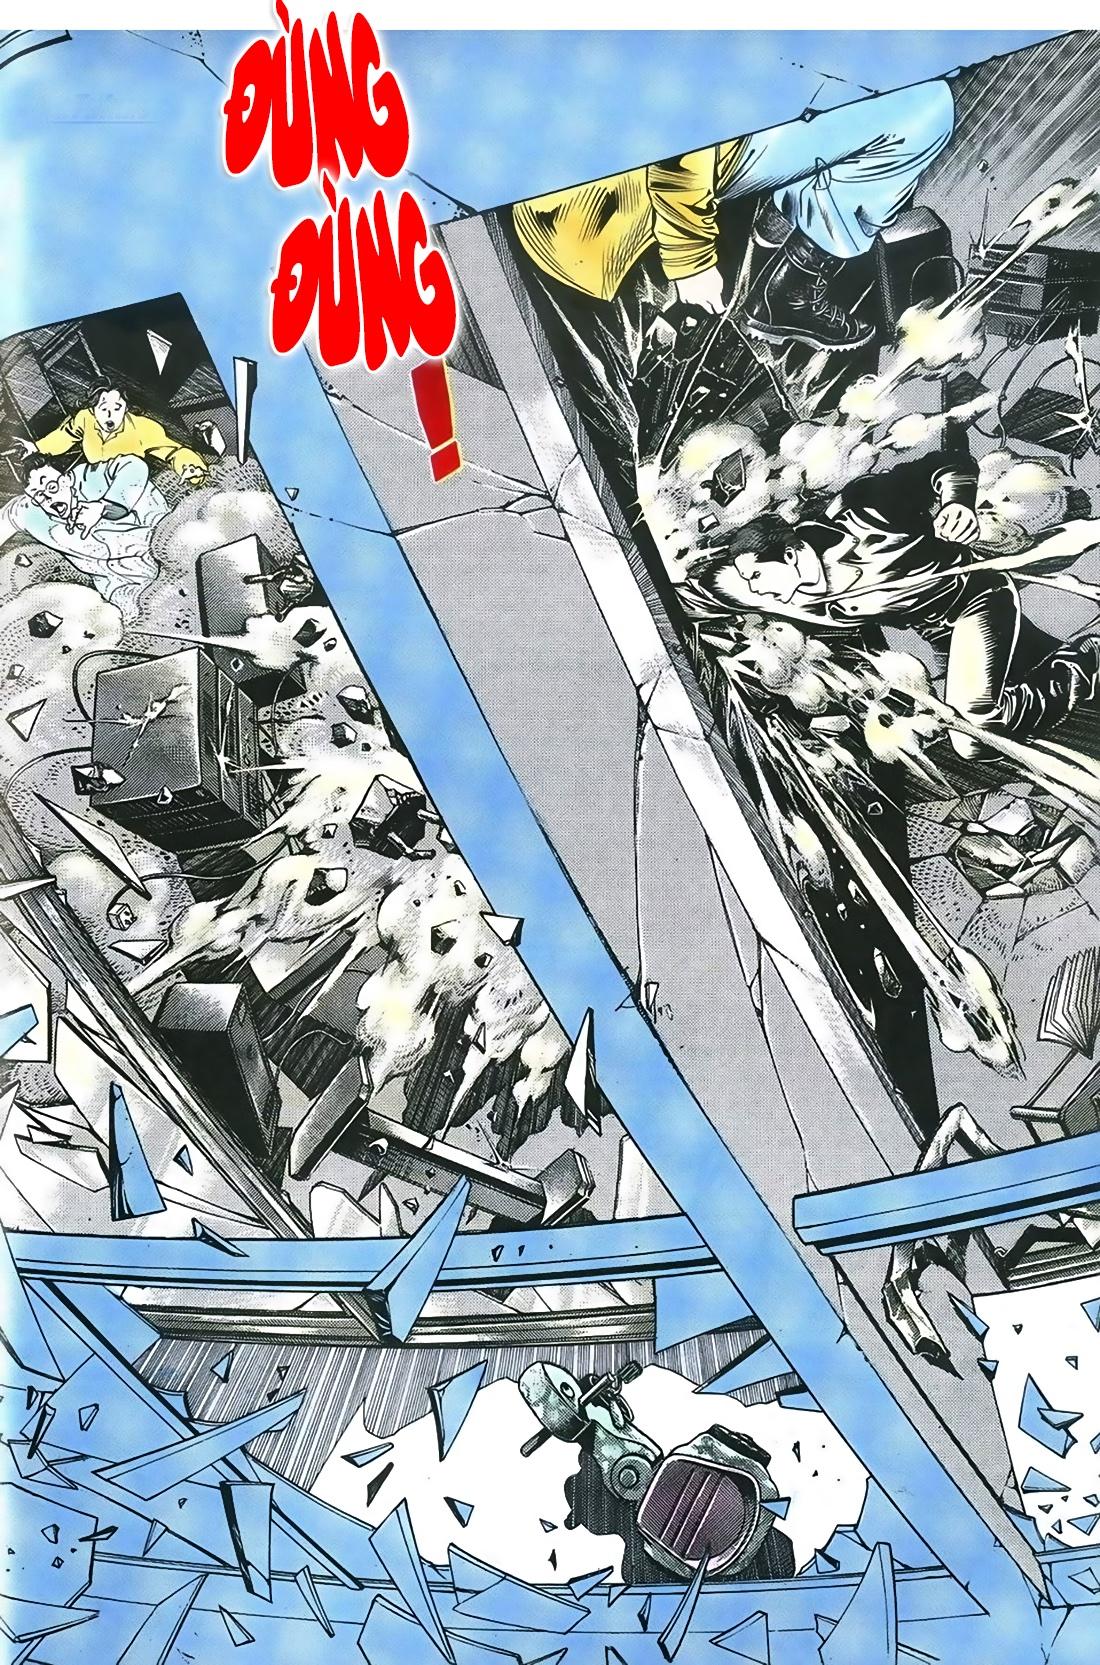 Thần Vương God Machine Chap 3 - Next Chap 4